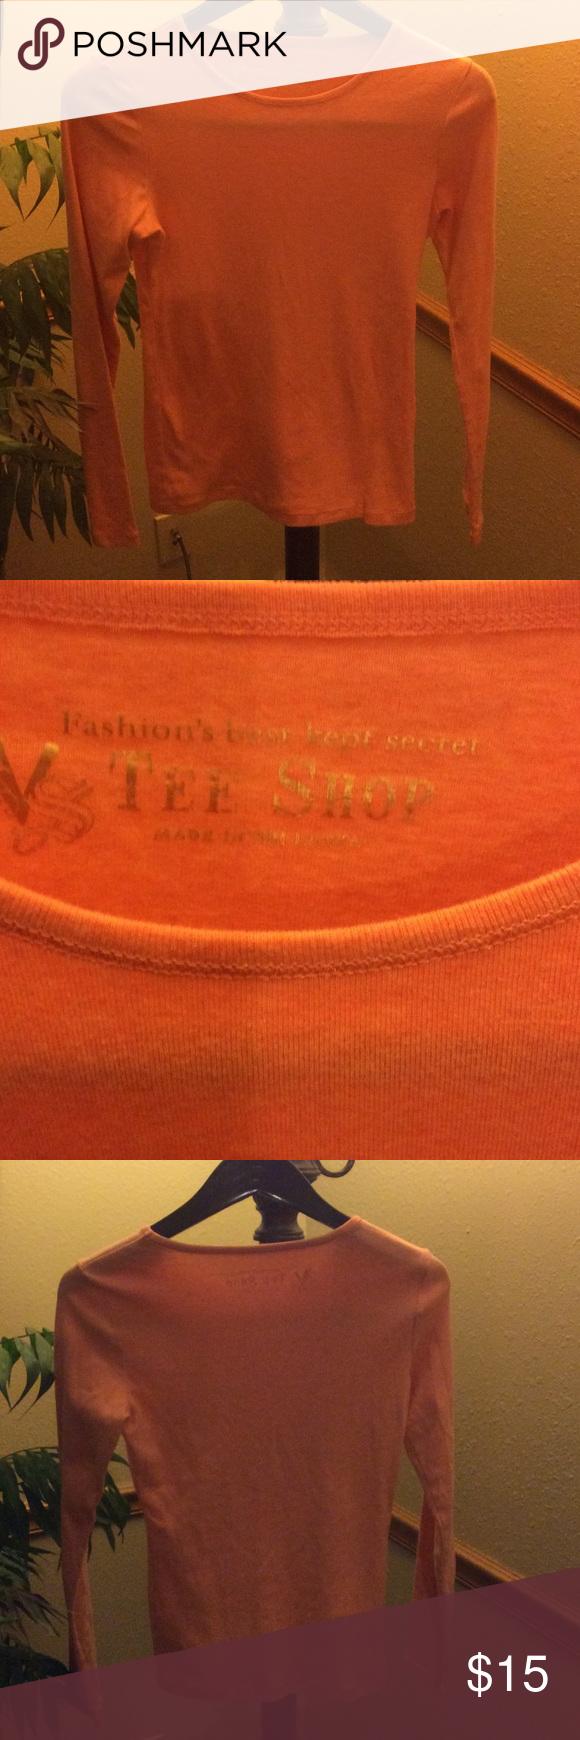 Victoria's Secret Long Sleeve Victoria's Secret long sleeve shirt in perfect condition. Victoria's Secret Tops Tees - Long Sleeve